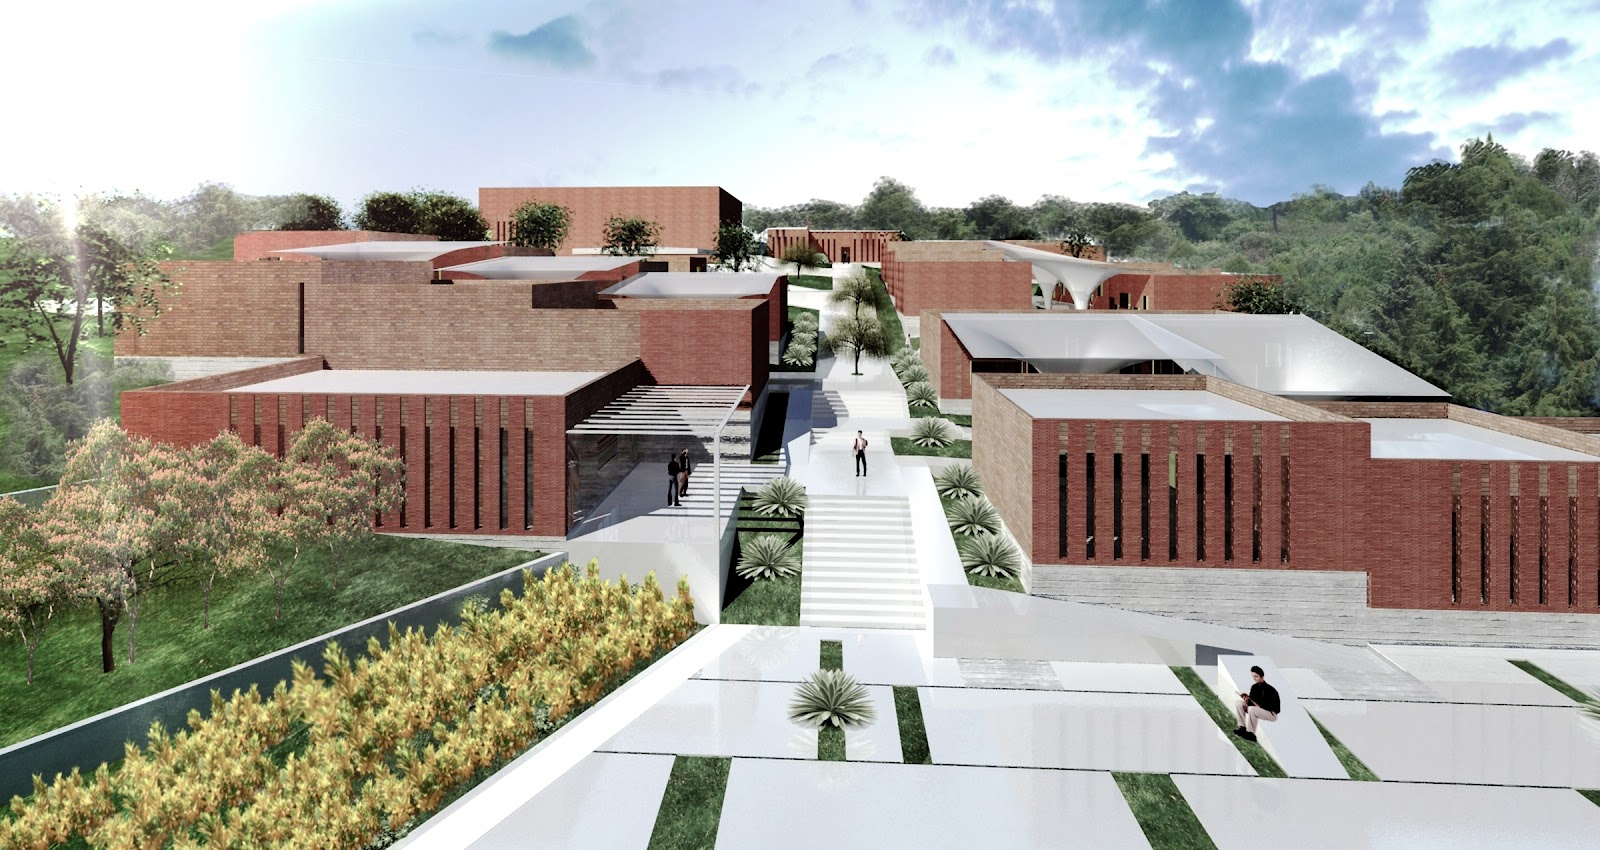 Apuntes revista digital de arquitectura proyecto for Facultad de arquitectura